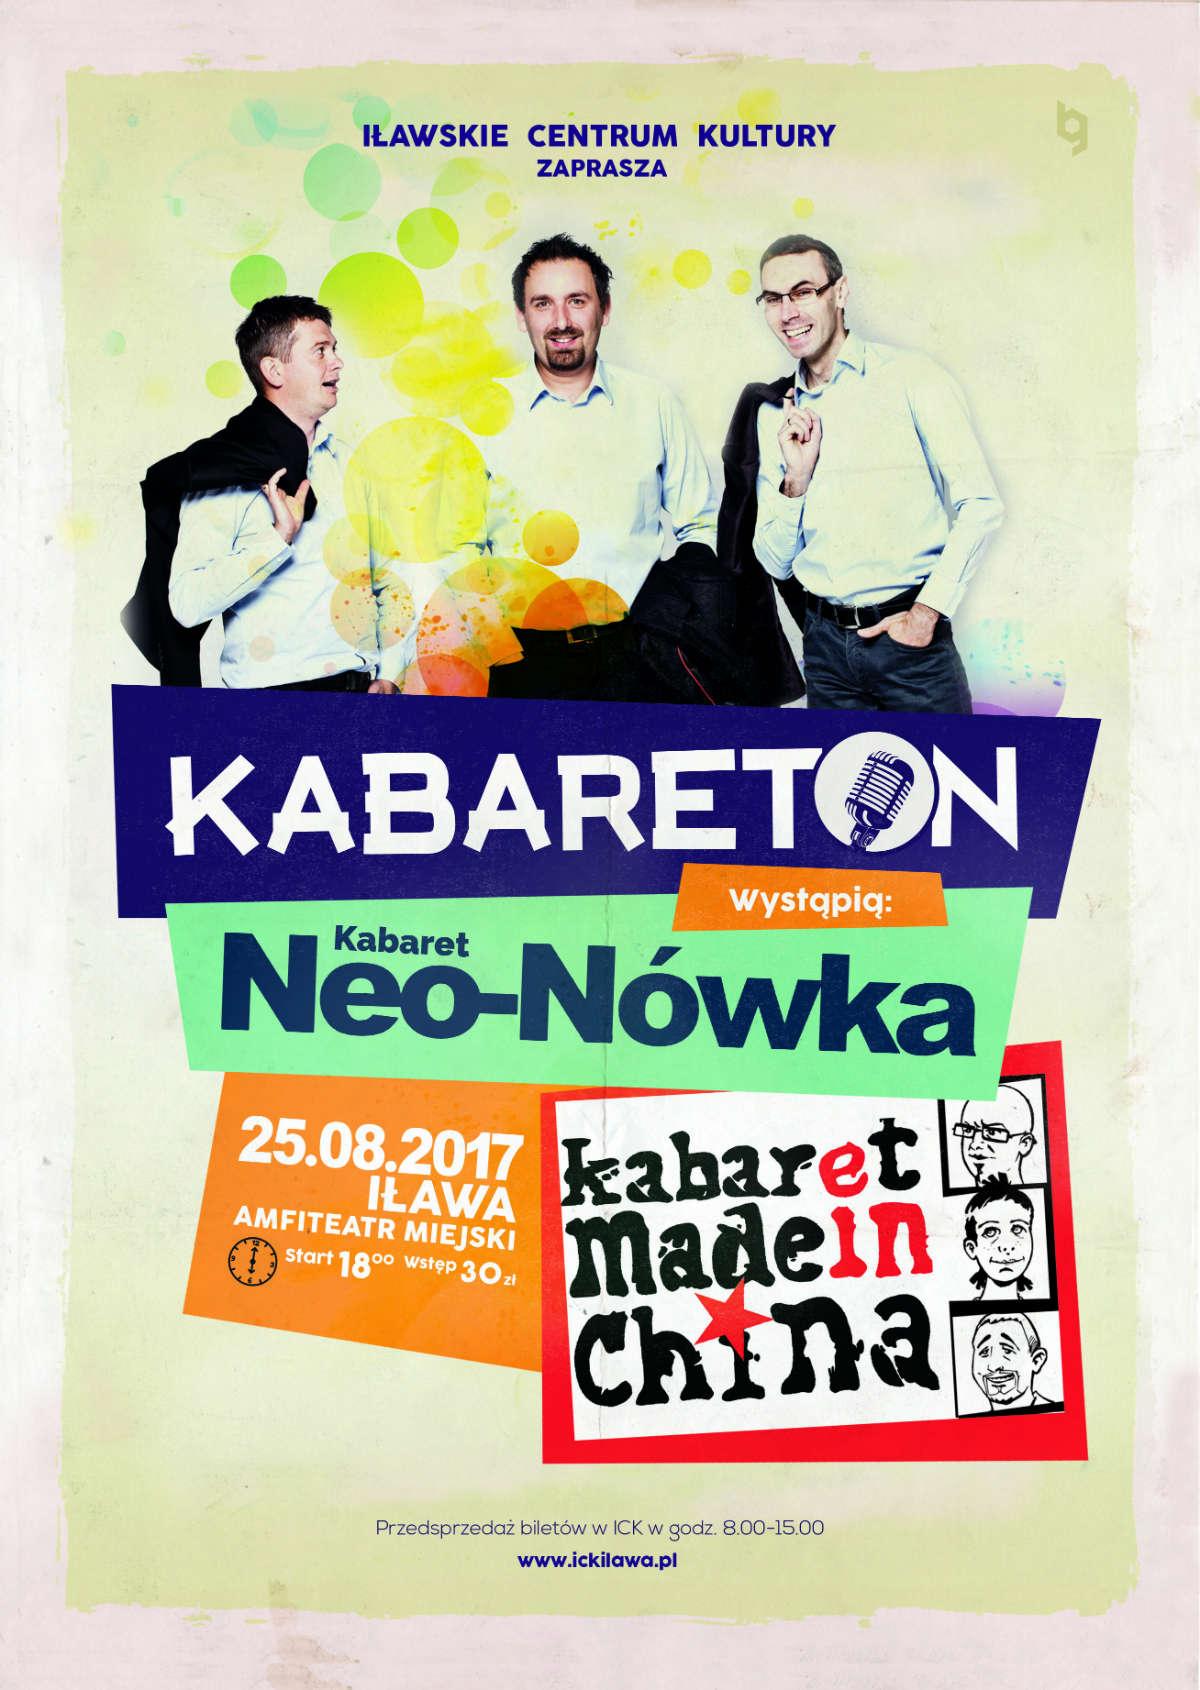 Kabareton w Iławie. Made In China i Neo – Nówka! - full image